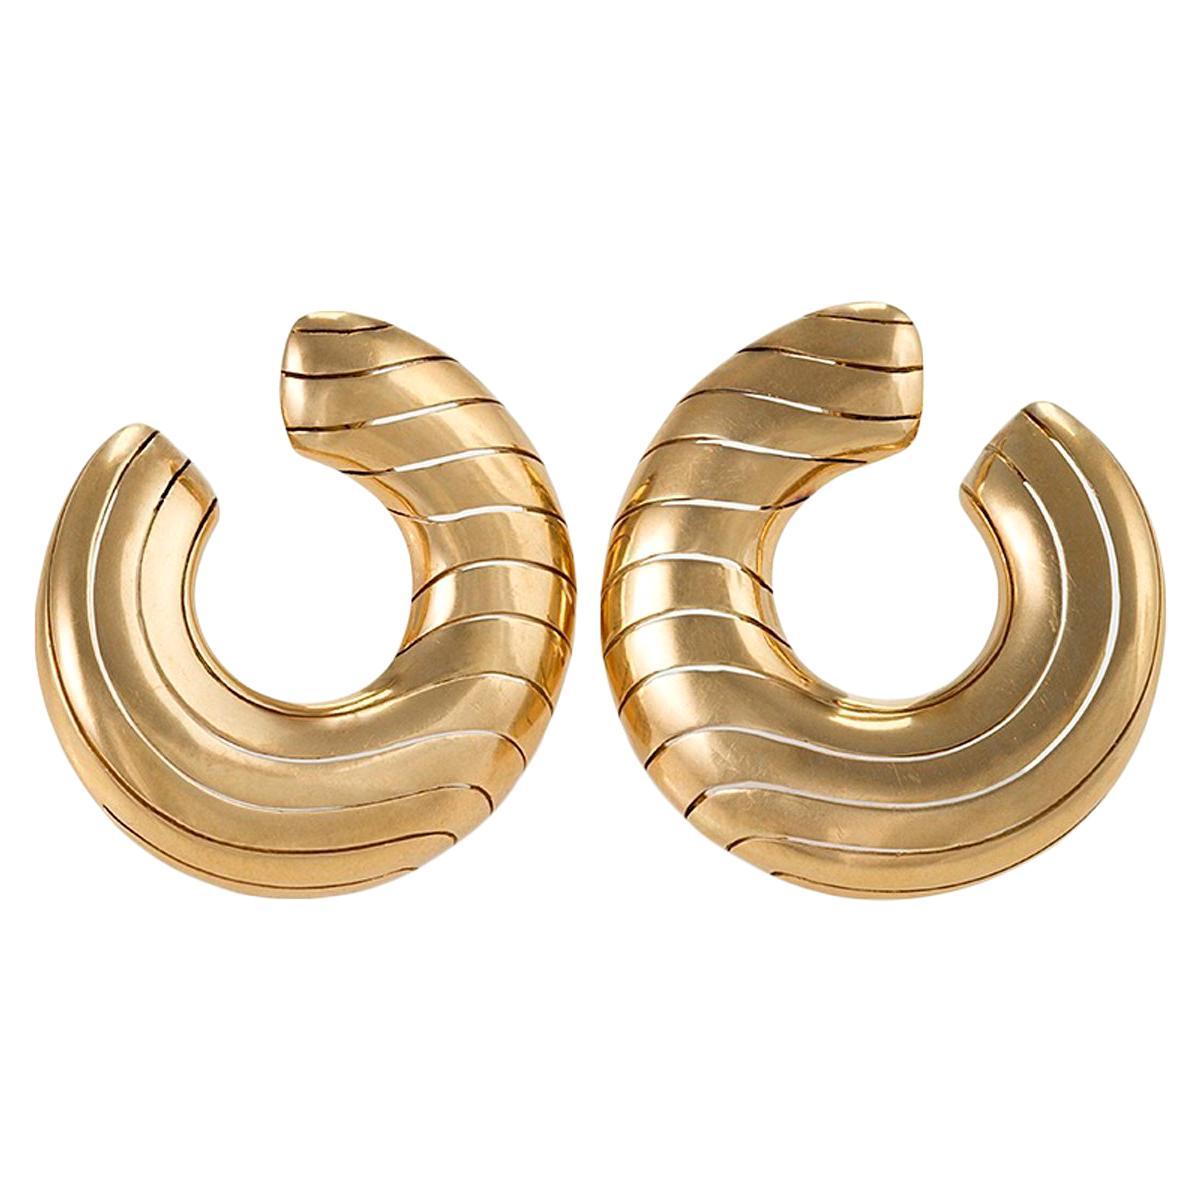 Cartier Paris 1980s Gold Hoop Earrings